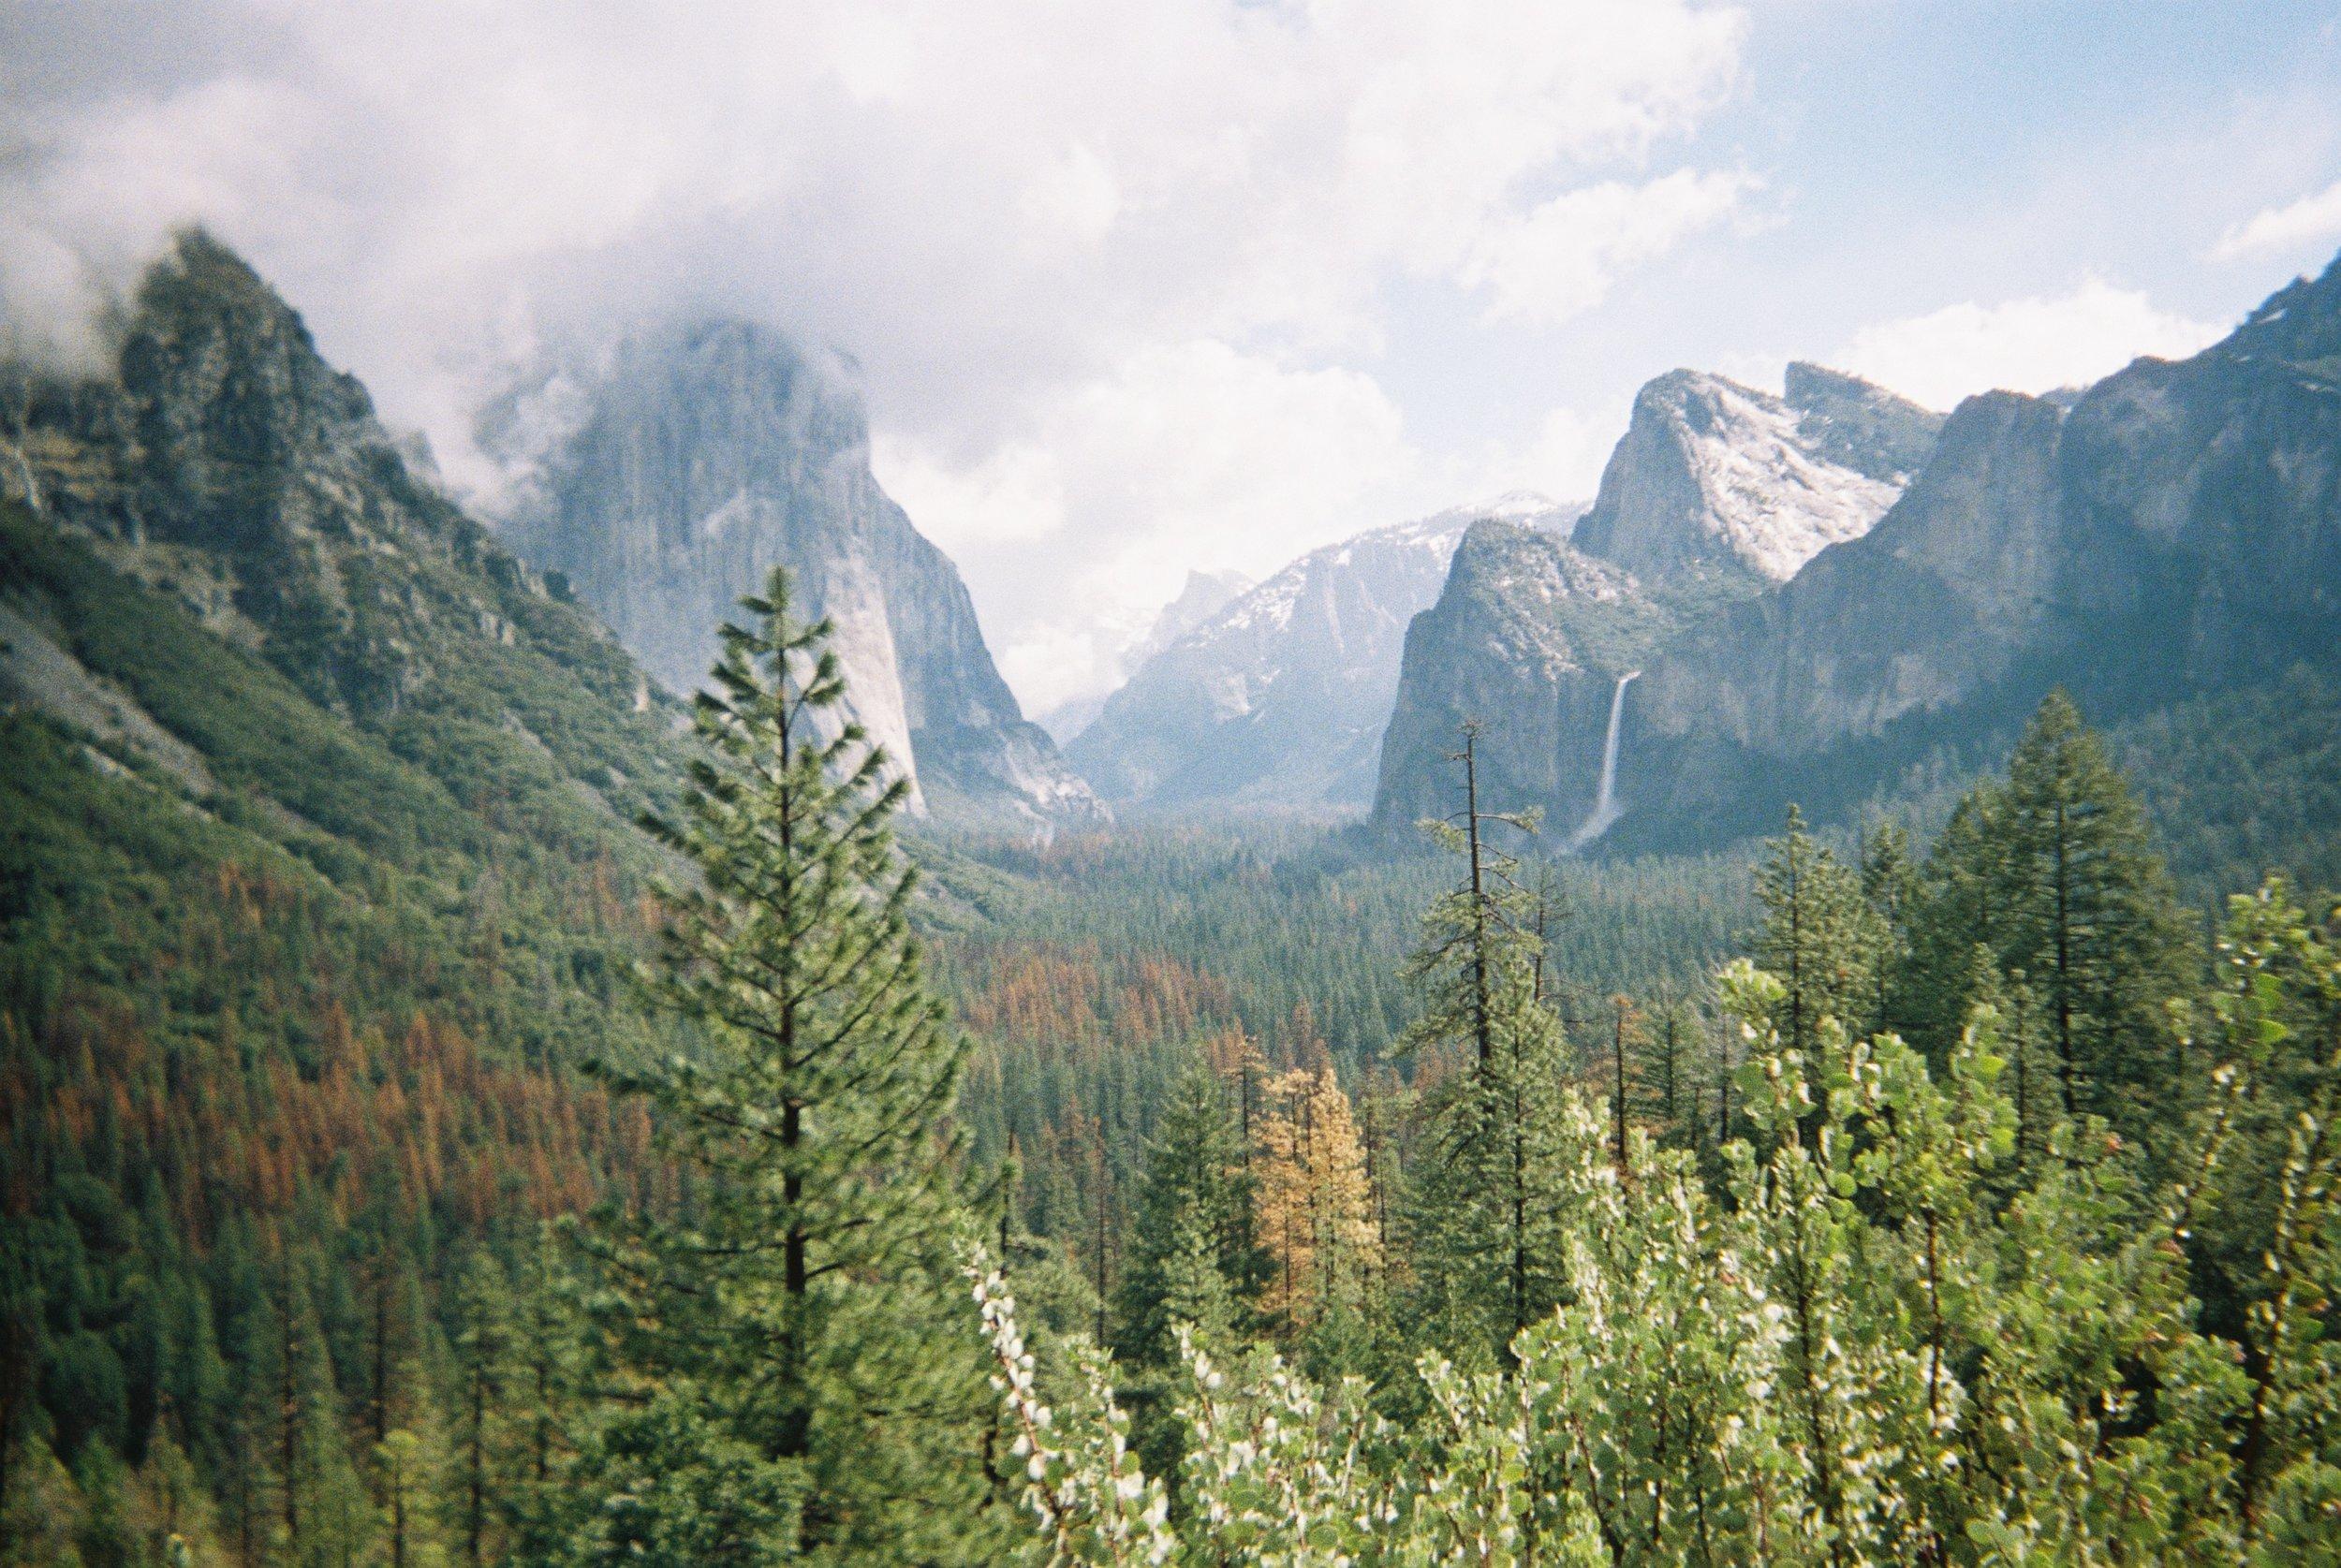 Tunnel View I Yosemite National Park, California